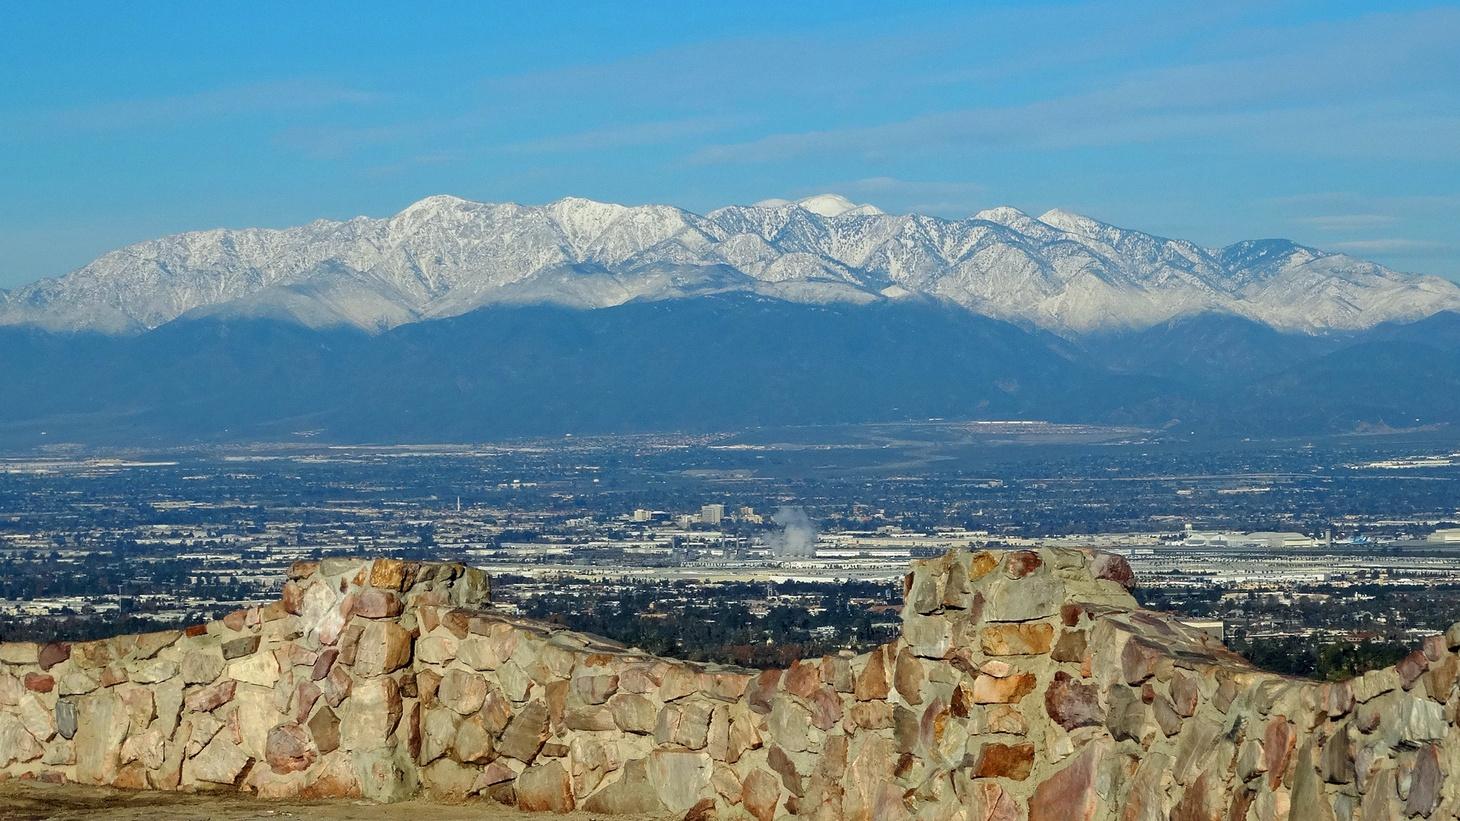 San Gabriel Mountains over Inland Empire, CA.